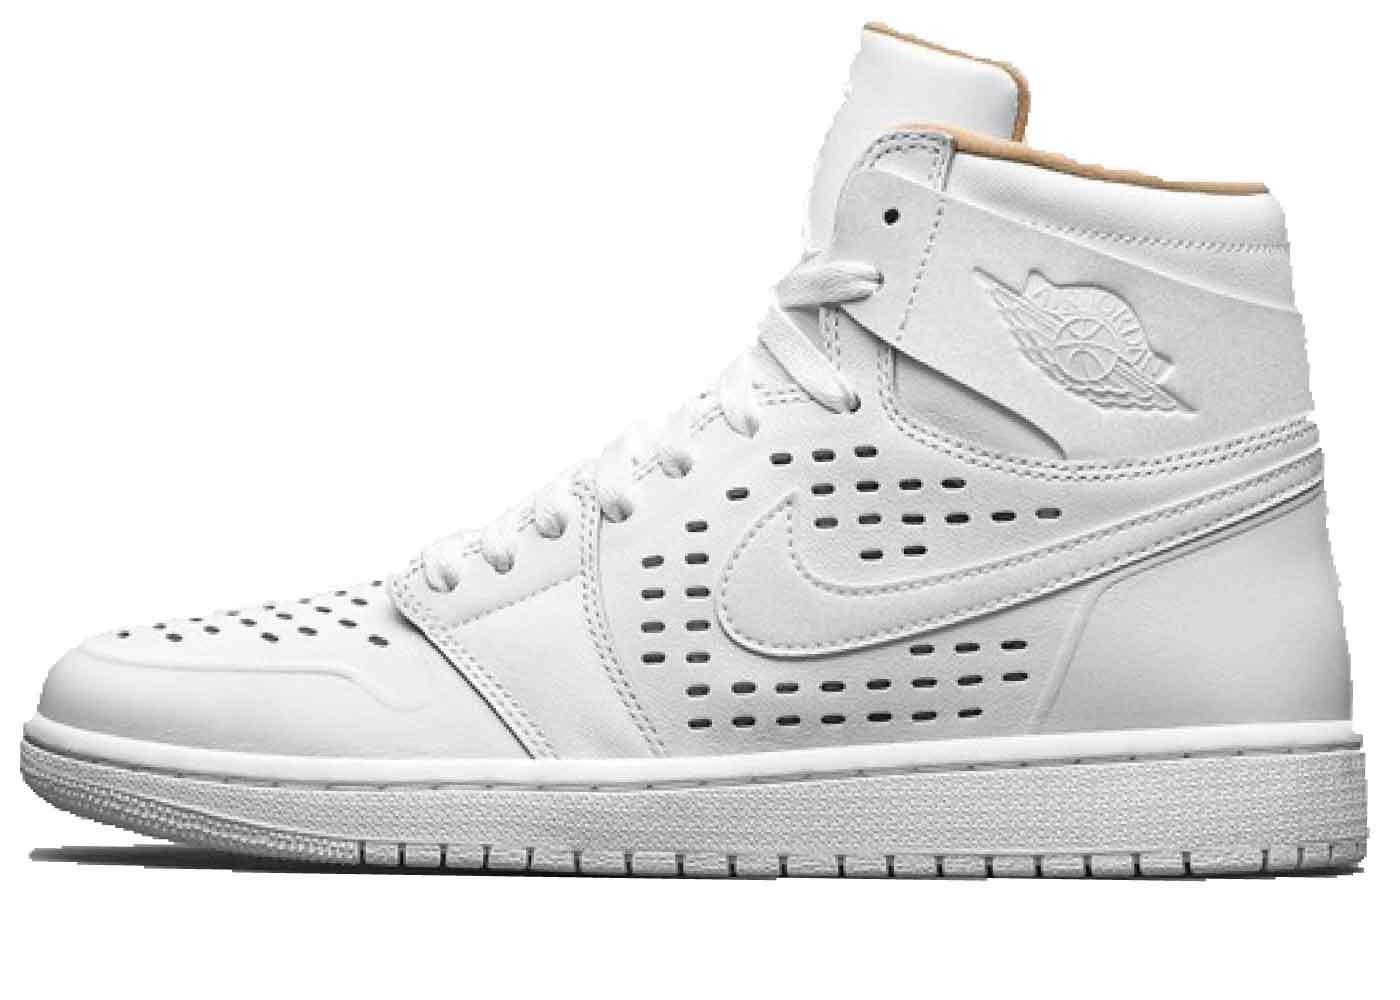 Nike Air Jordan 1 Retro White Vachetta Tanの写真